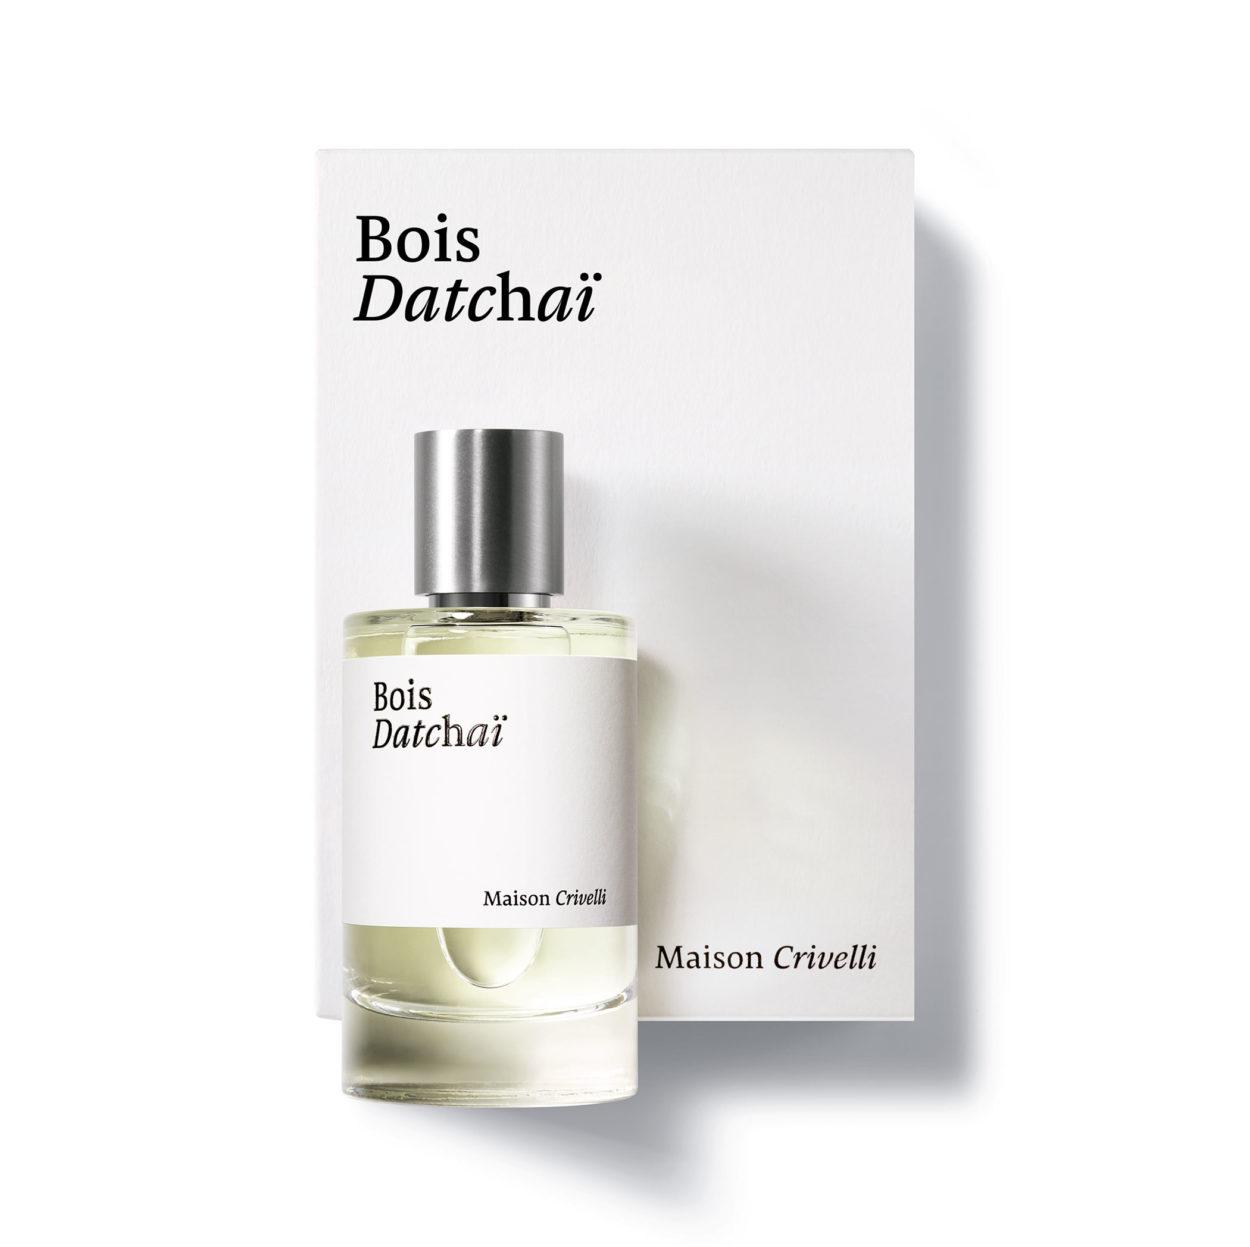 bois datchai smoky fruity wood 100ml niche perfume - Maison Crivelli